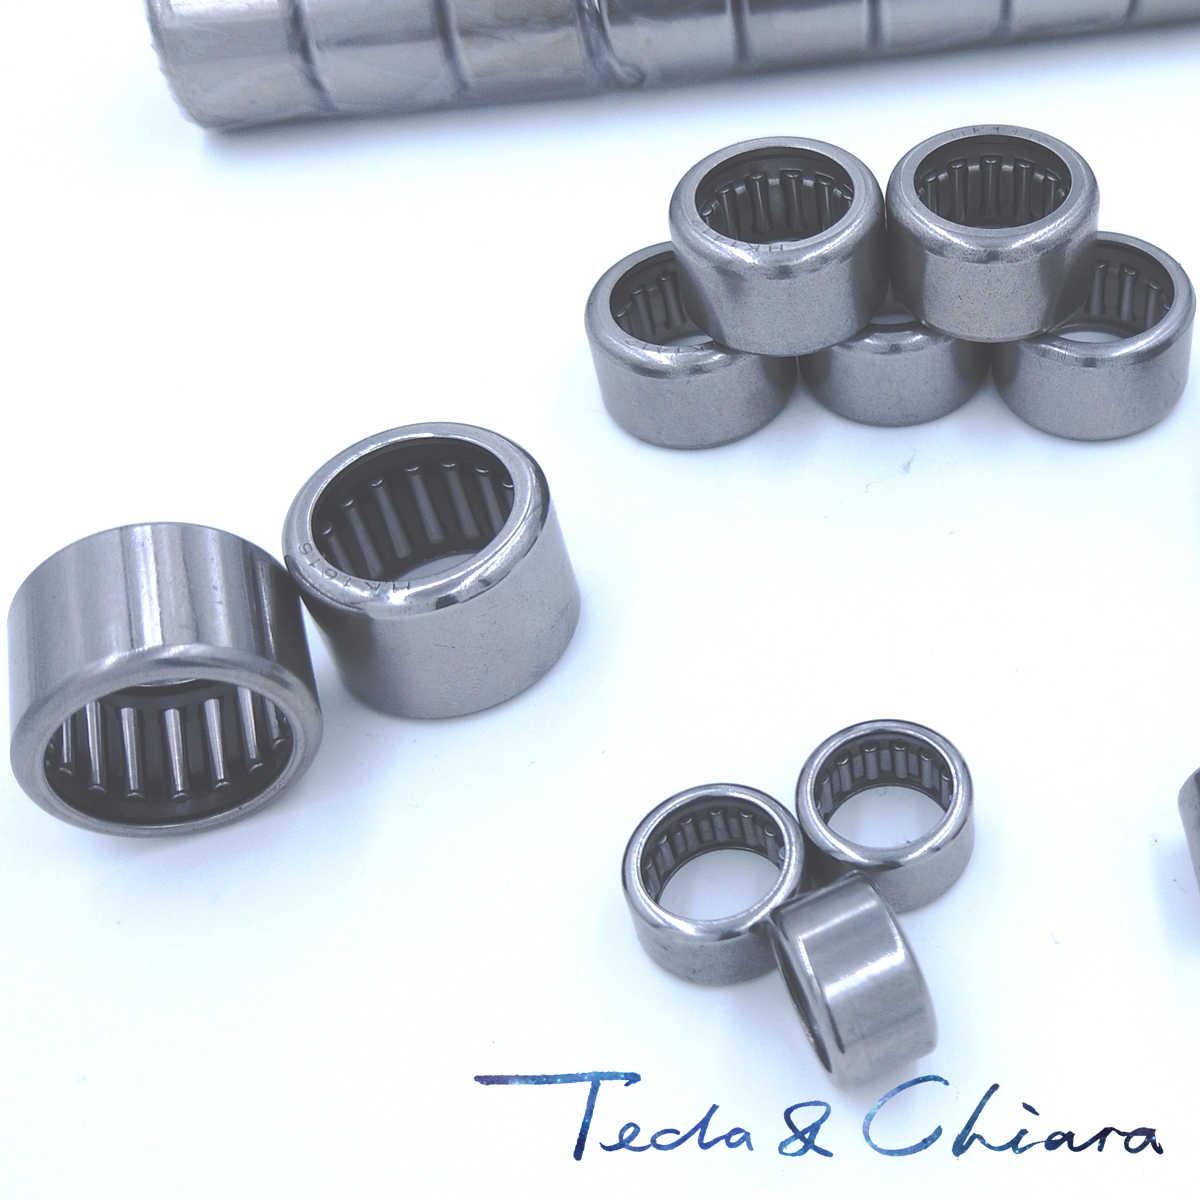 HK2014 Needle Roller Bearing 20mm x 26mm x 14mm 12 PCS 20x26x14 mm